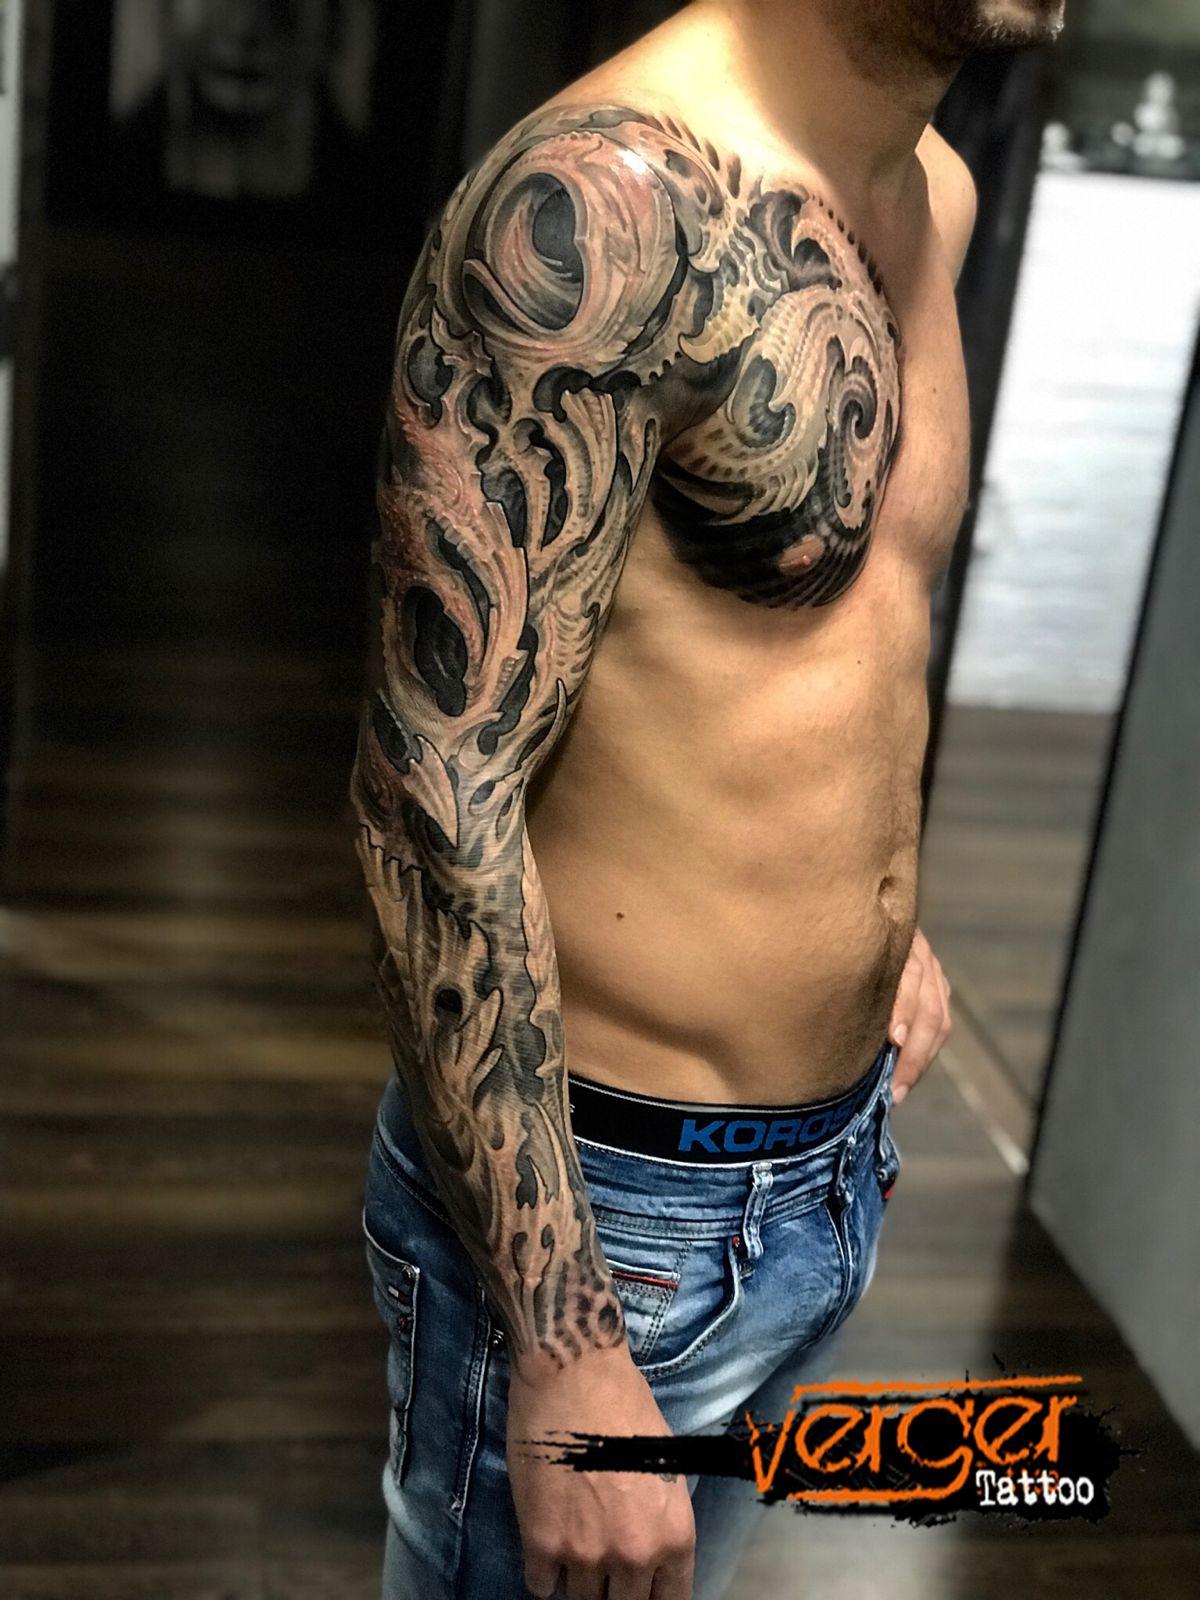 Tatuajes Personalizados: Tatuajes de Verger Tattoo